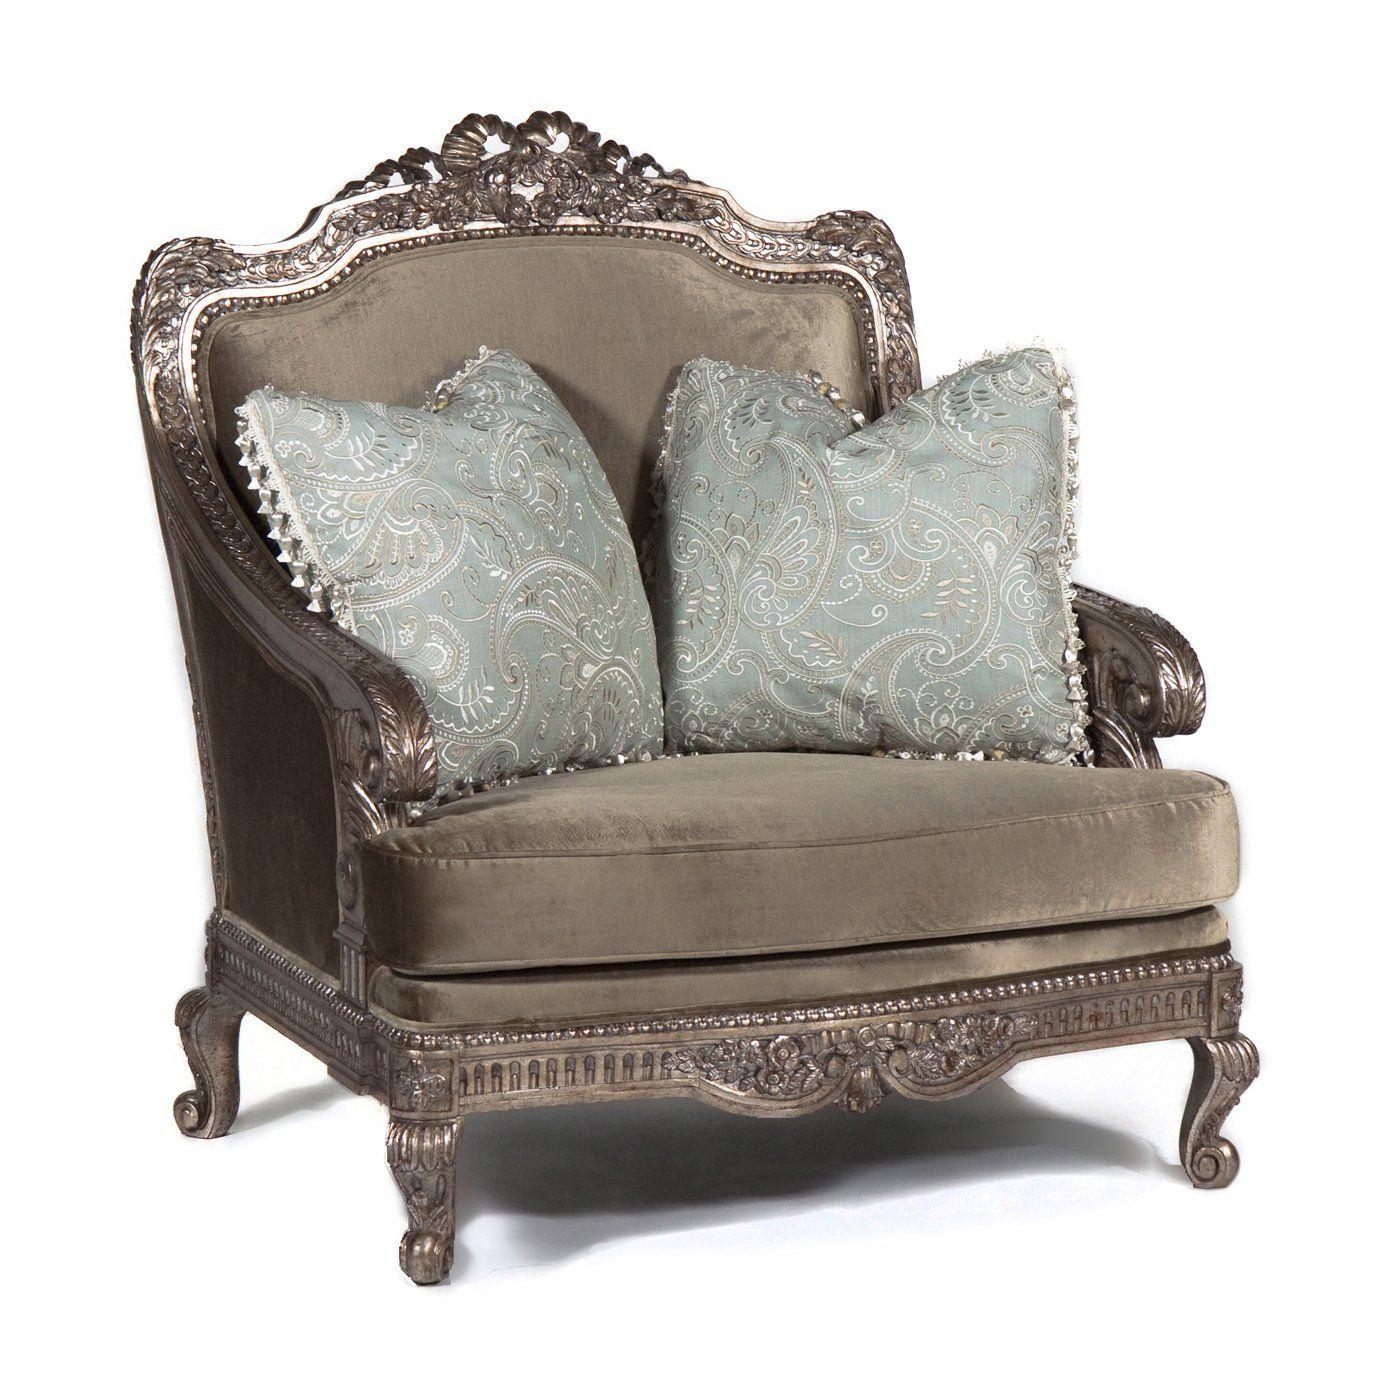 Ital Art Design Rgf Venice L Lounge Accent Chair Atg S